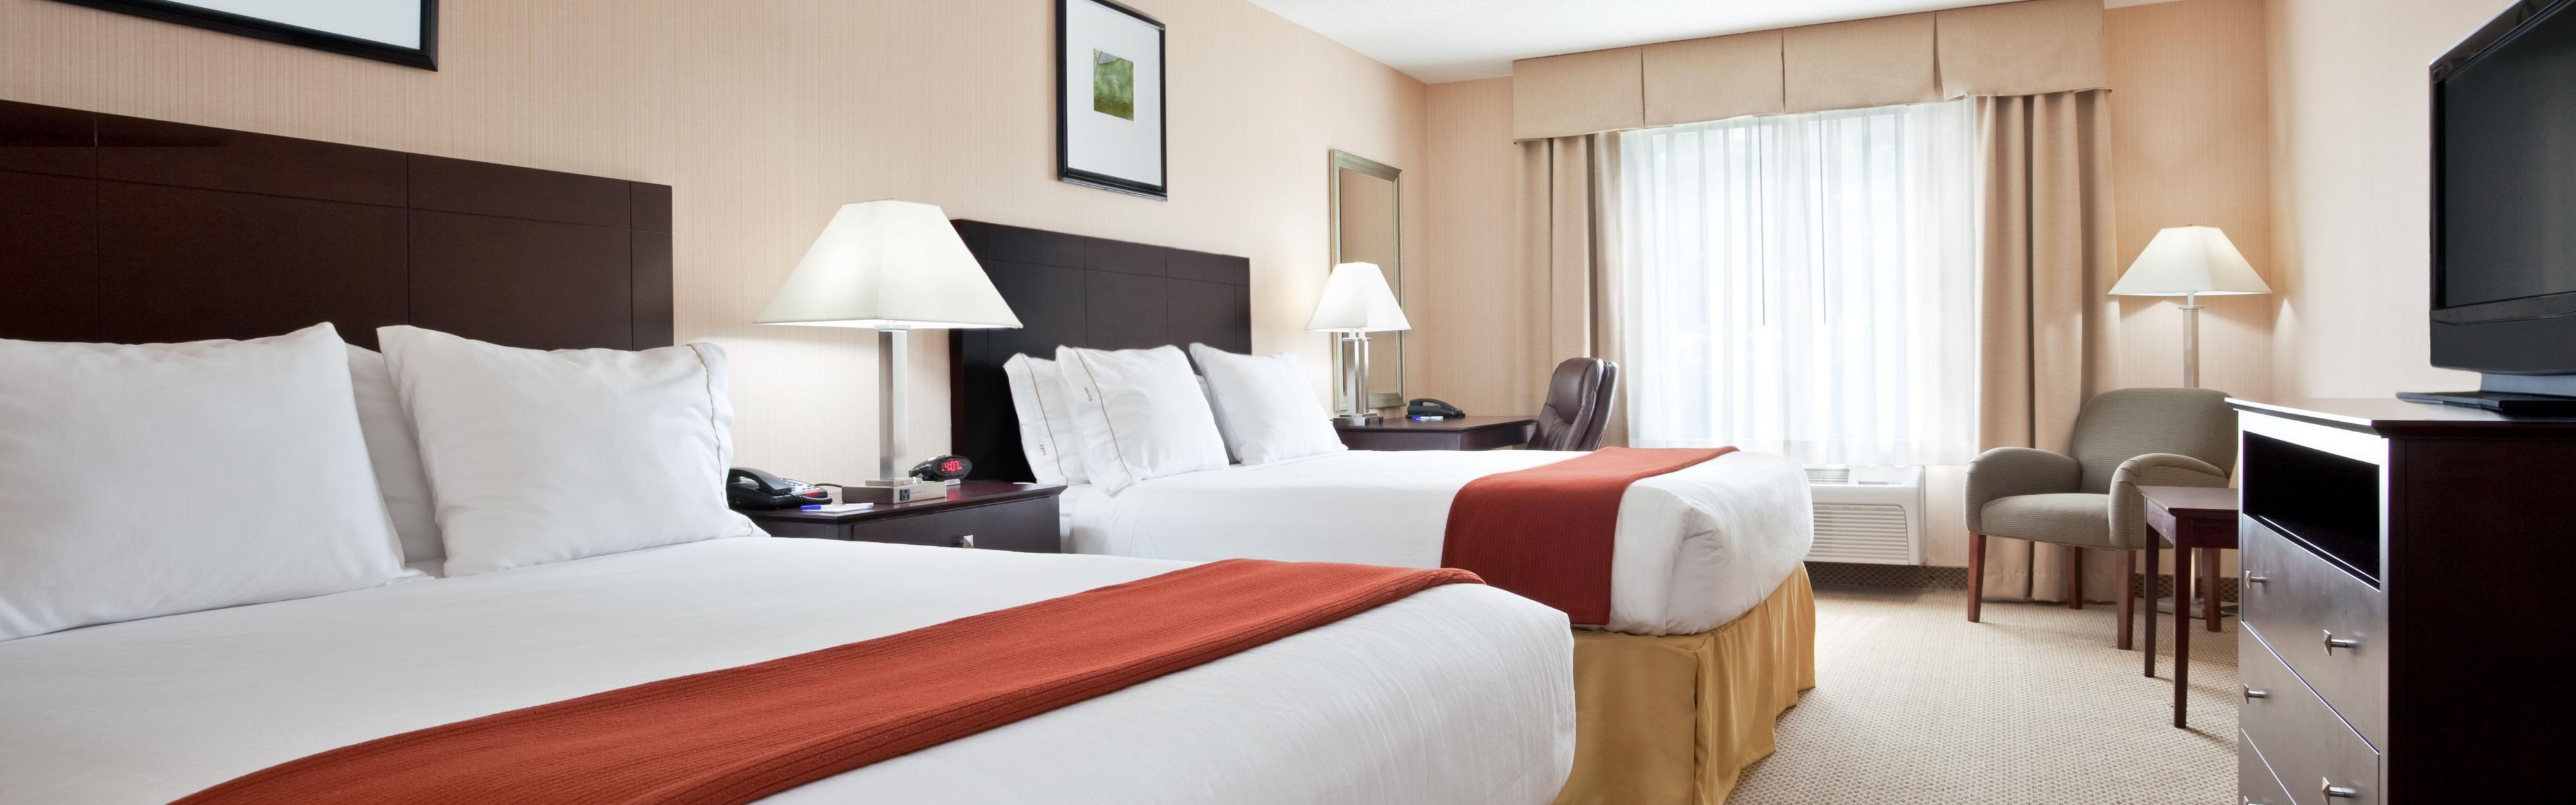 Motels In Tipp City Ohio